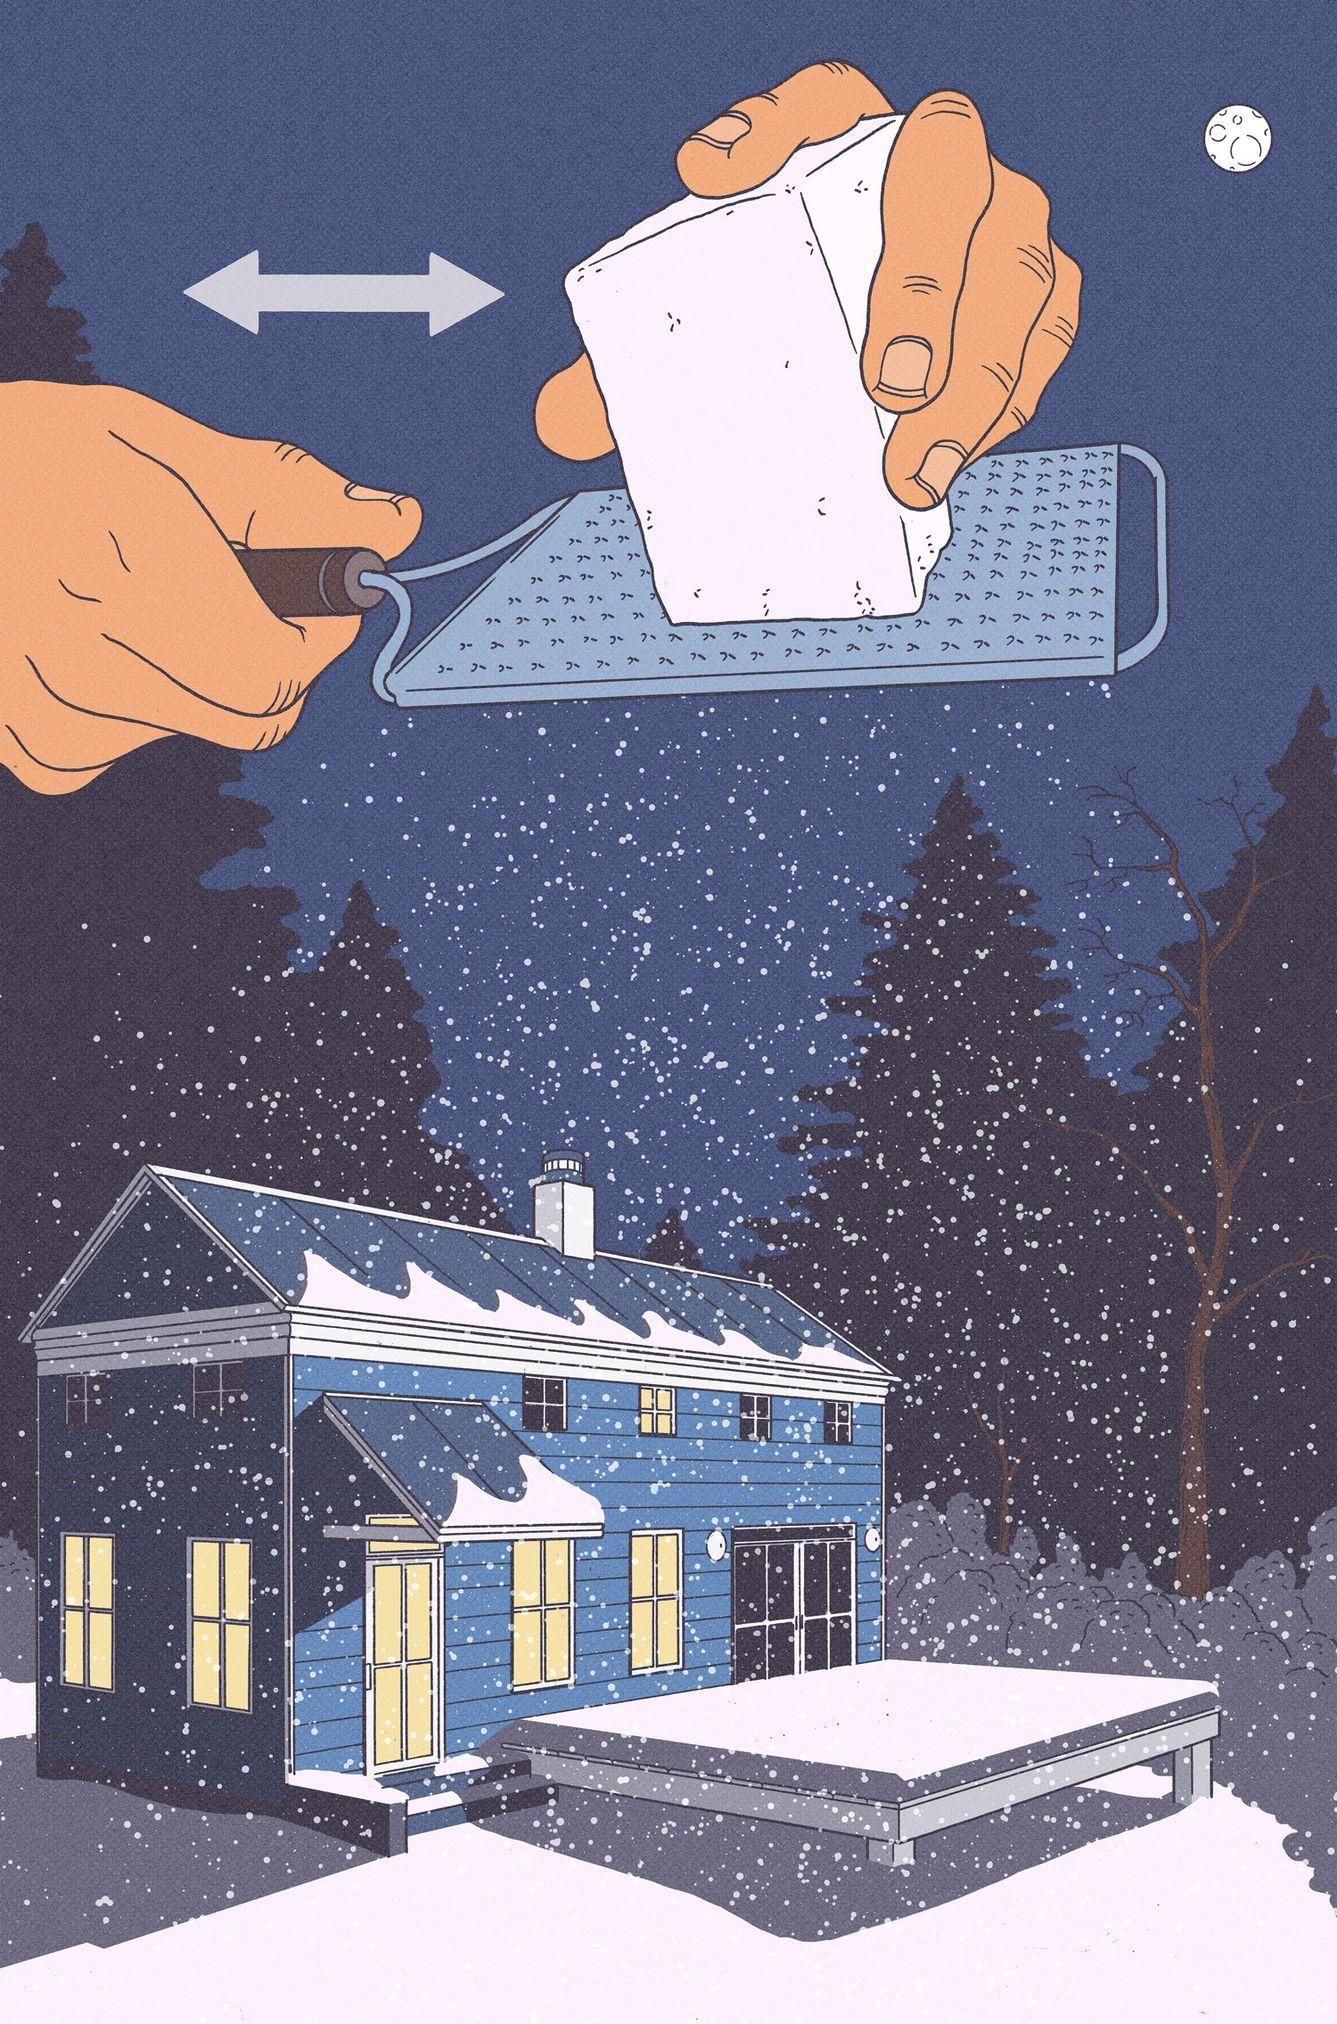 garance-illustration-Kyle-Ellingson-Personal-Work-New-England-White-Cheddar